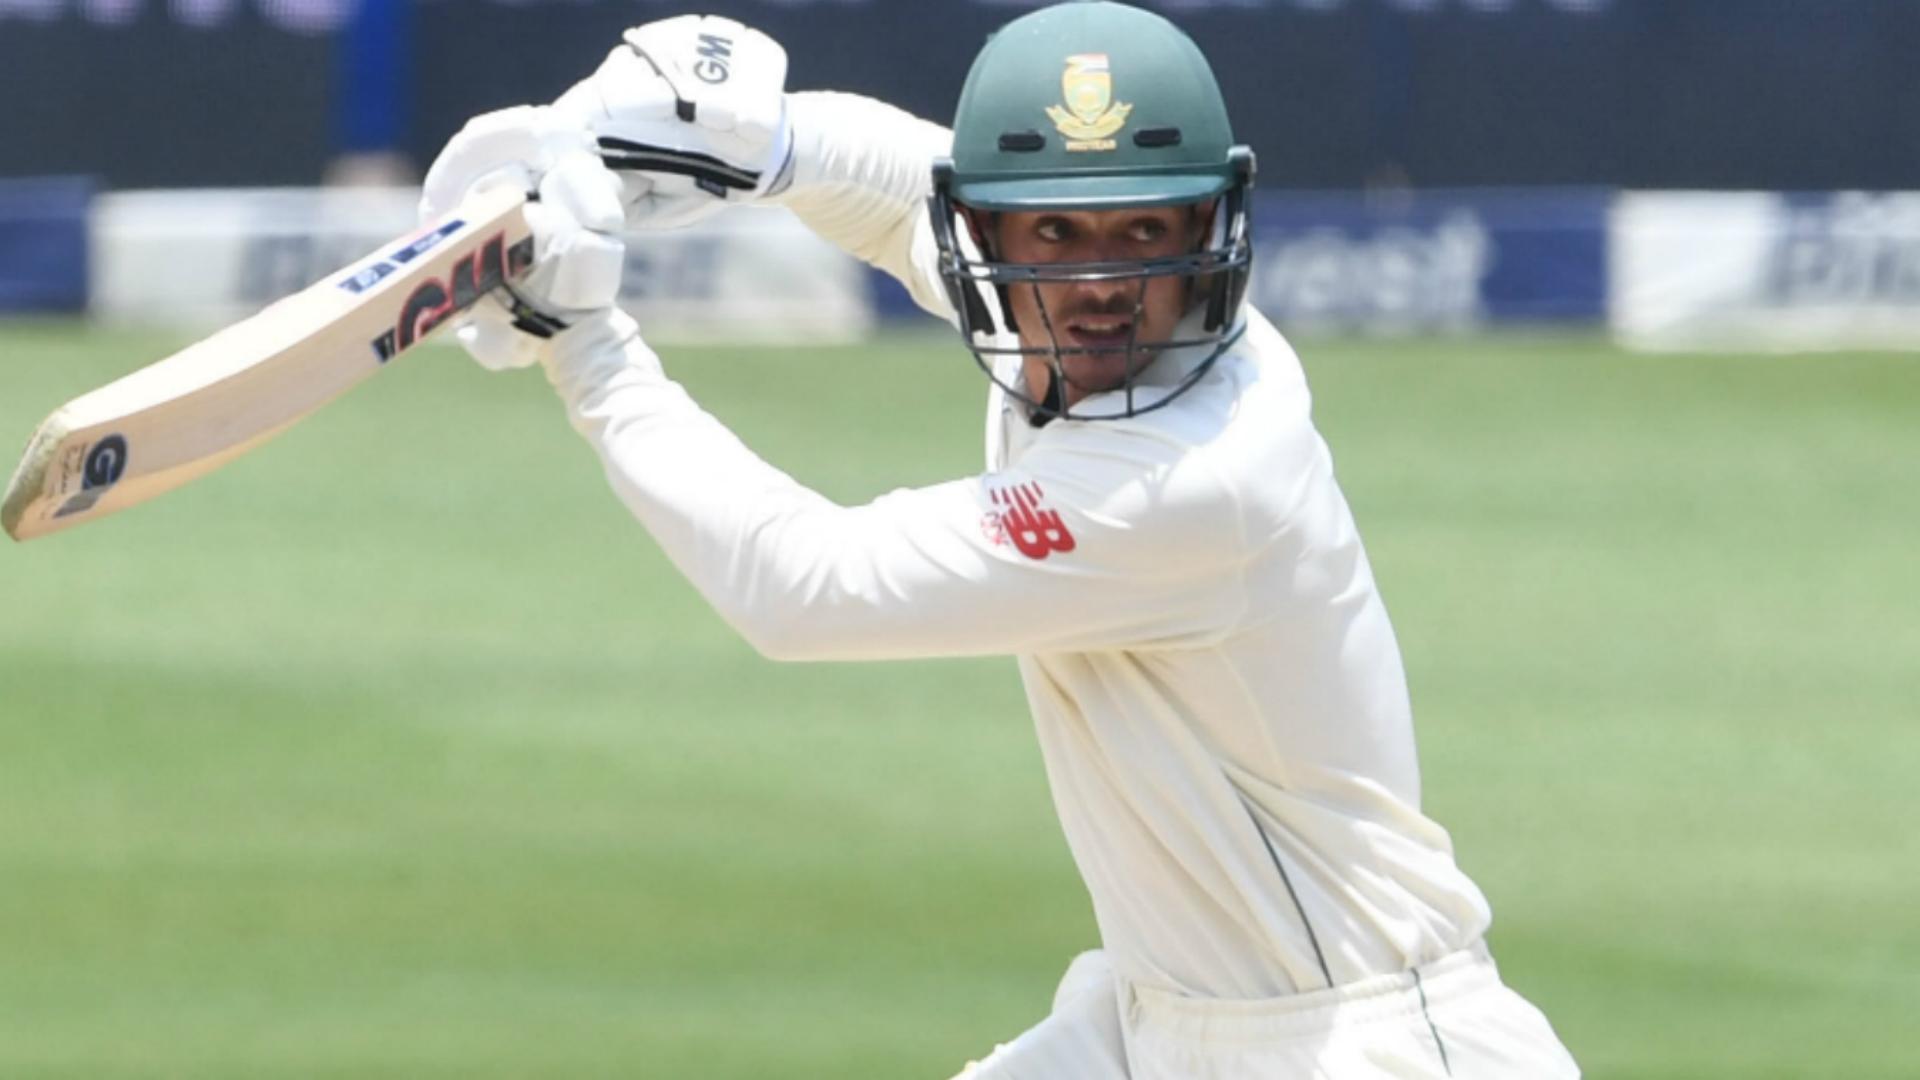 De Kock century puts SA in control